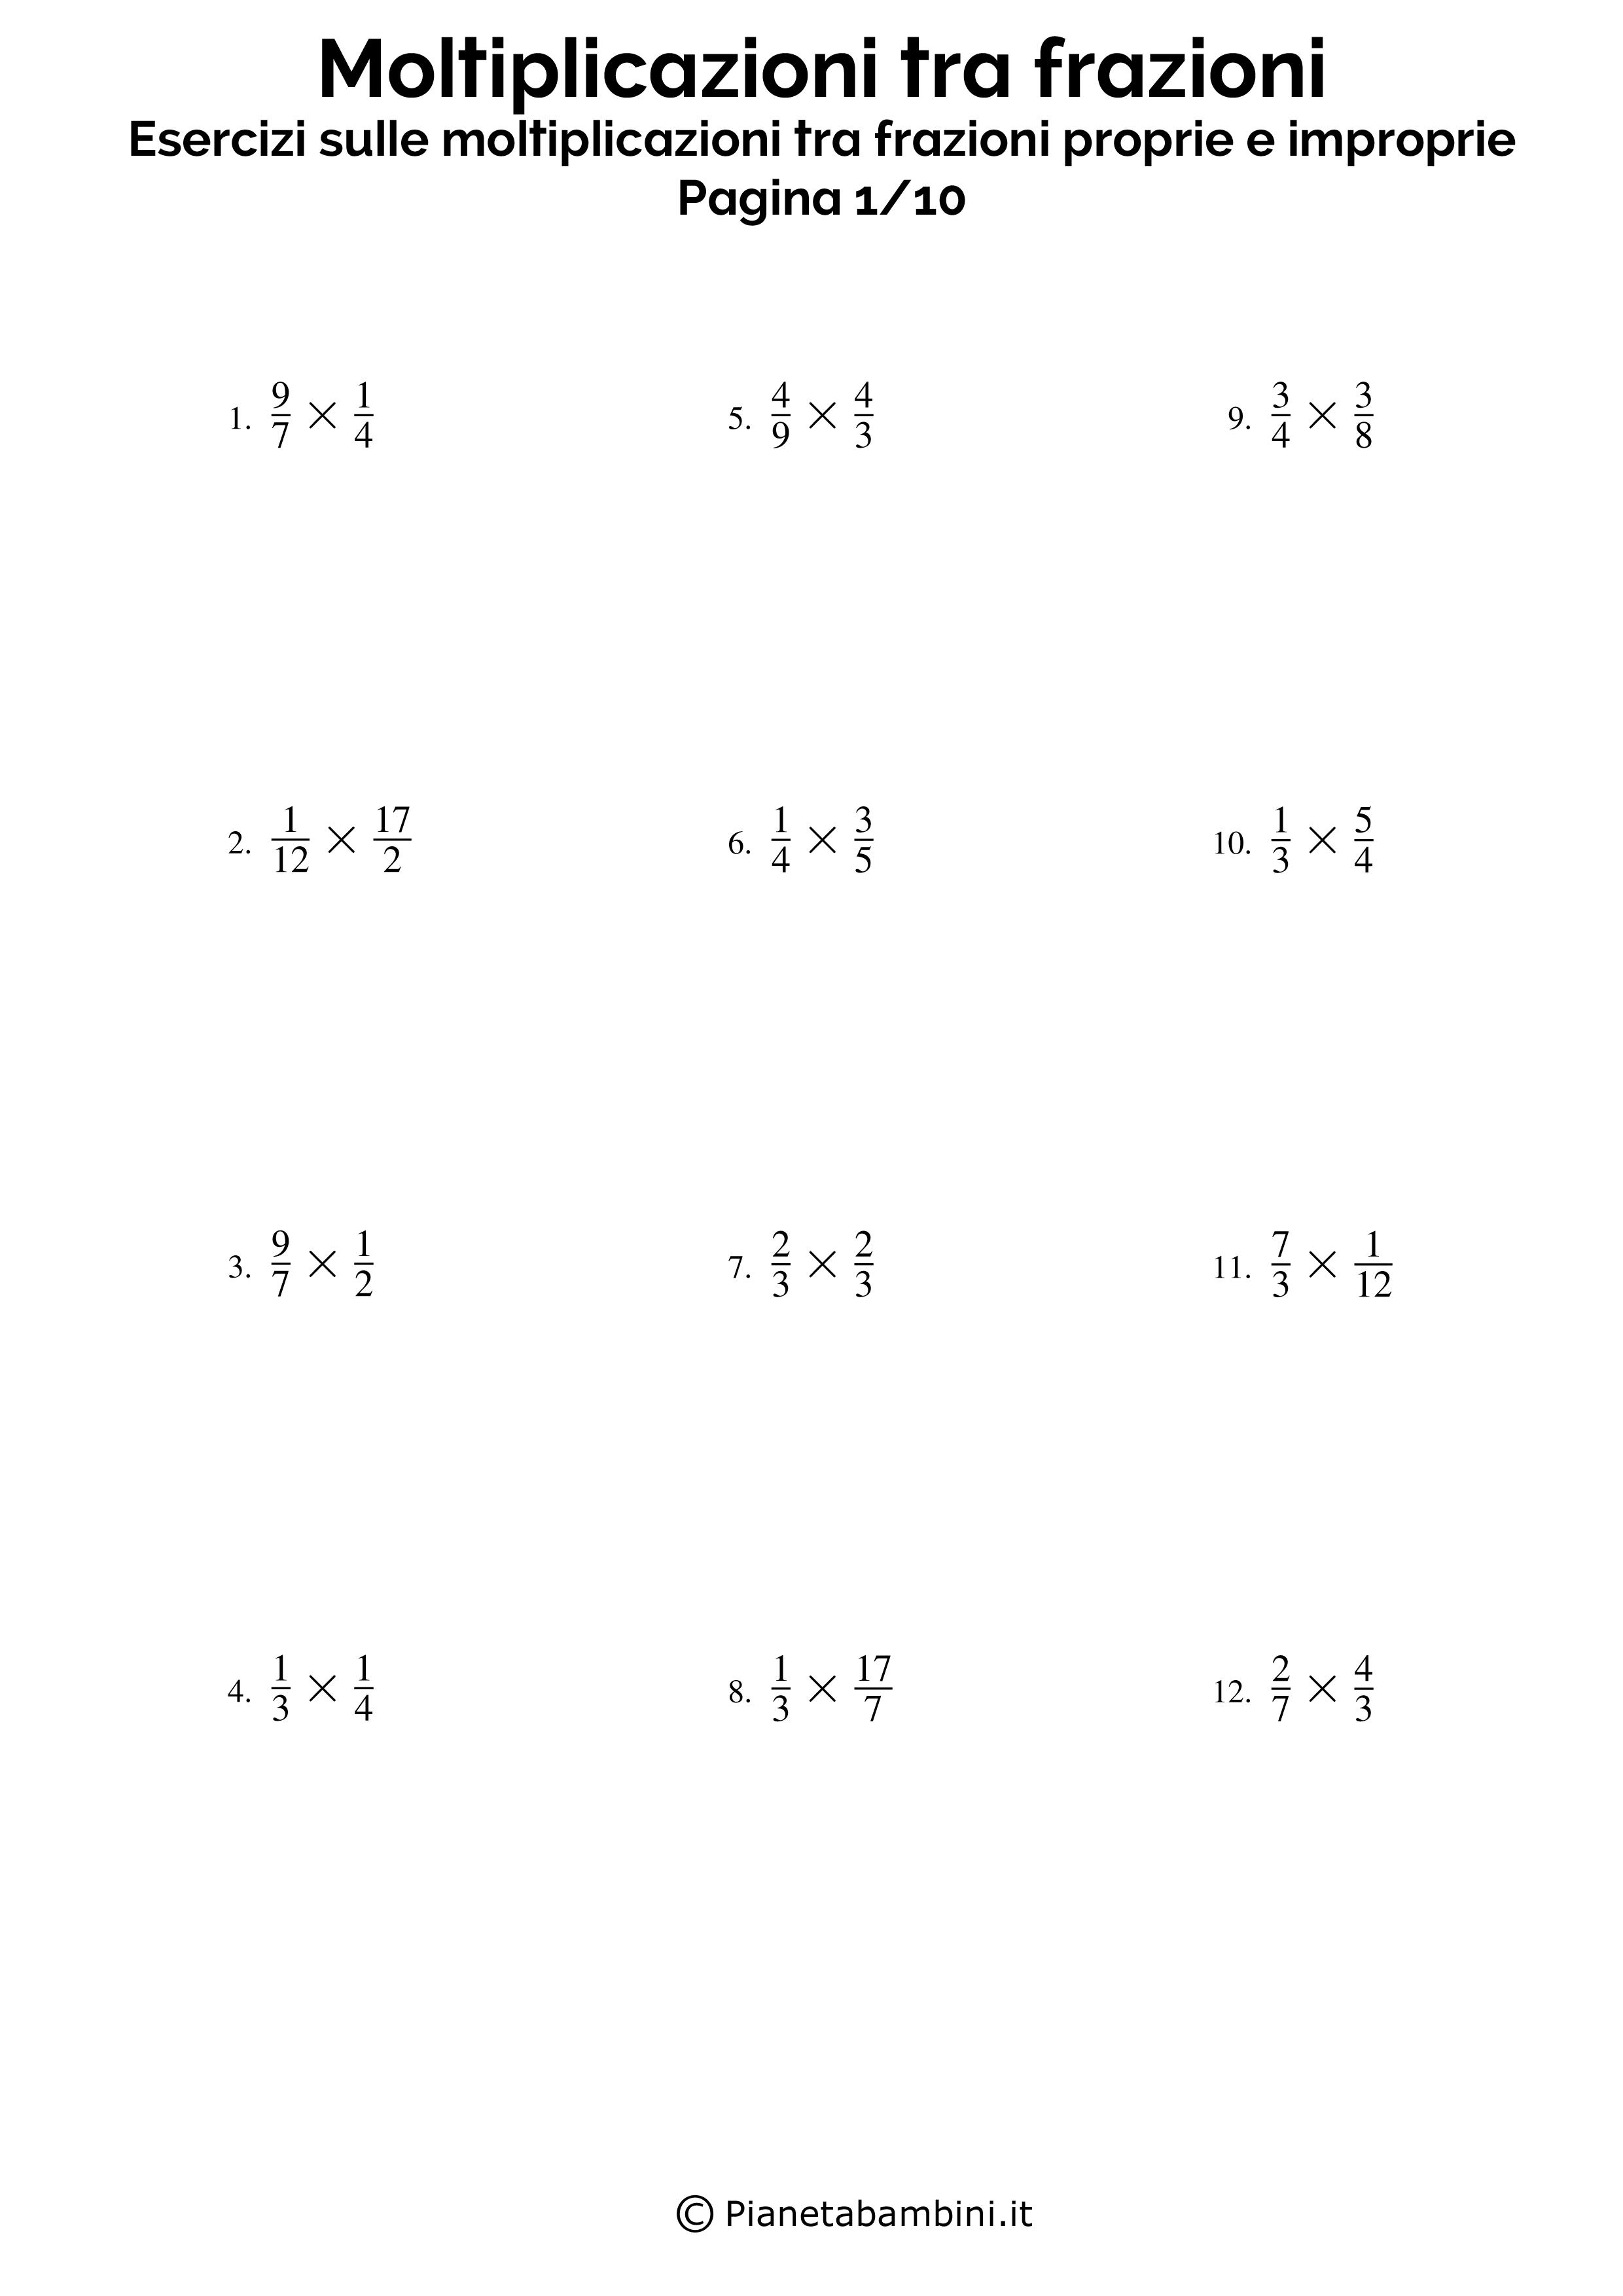 Moltiplicazioni-Frazioni-Proprie-Improprie_01